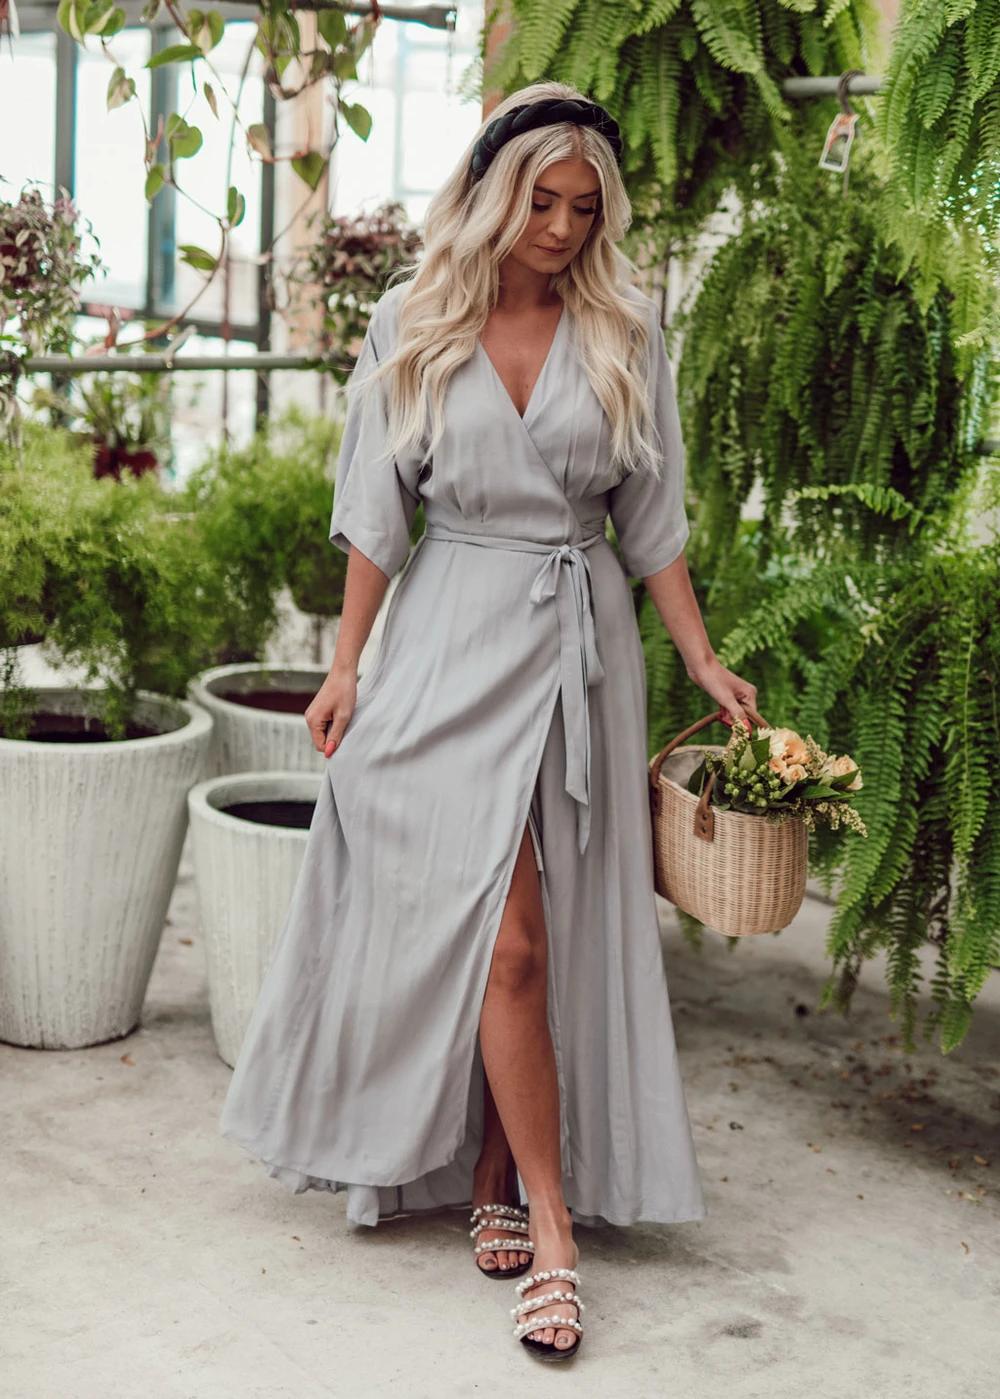 Chantilly Wrap Maxi Dress Jessakae Gray Dress Bridesmaid Dress Modest Dress Headband Tan Skin Womens Fashion S Maxi Wrap Dress Maxi Dress Dreamy Dress [ 1399 x 1000 Pixel ]